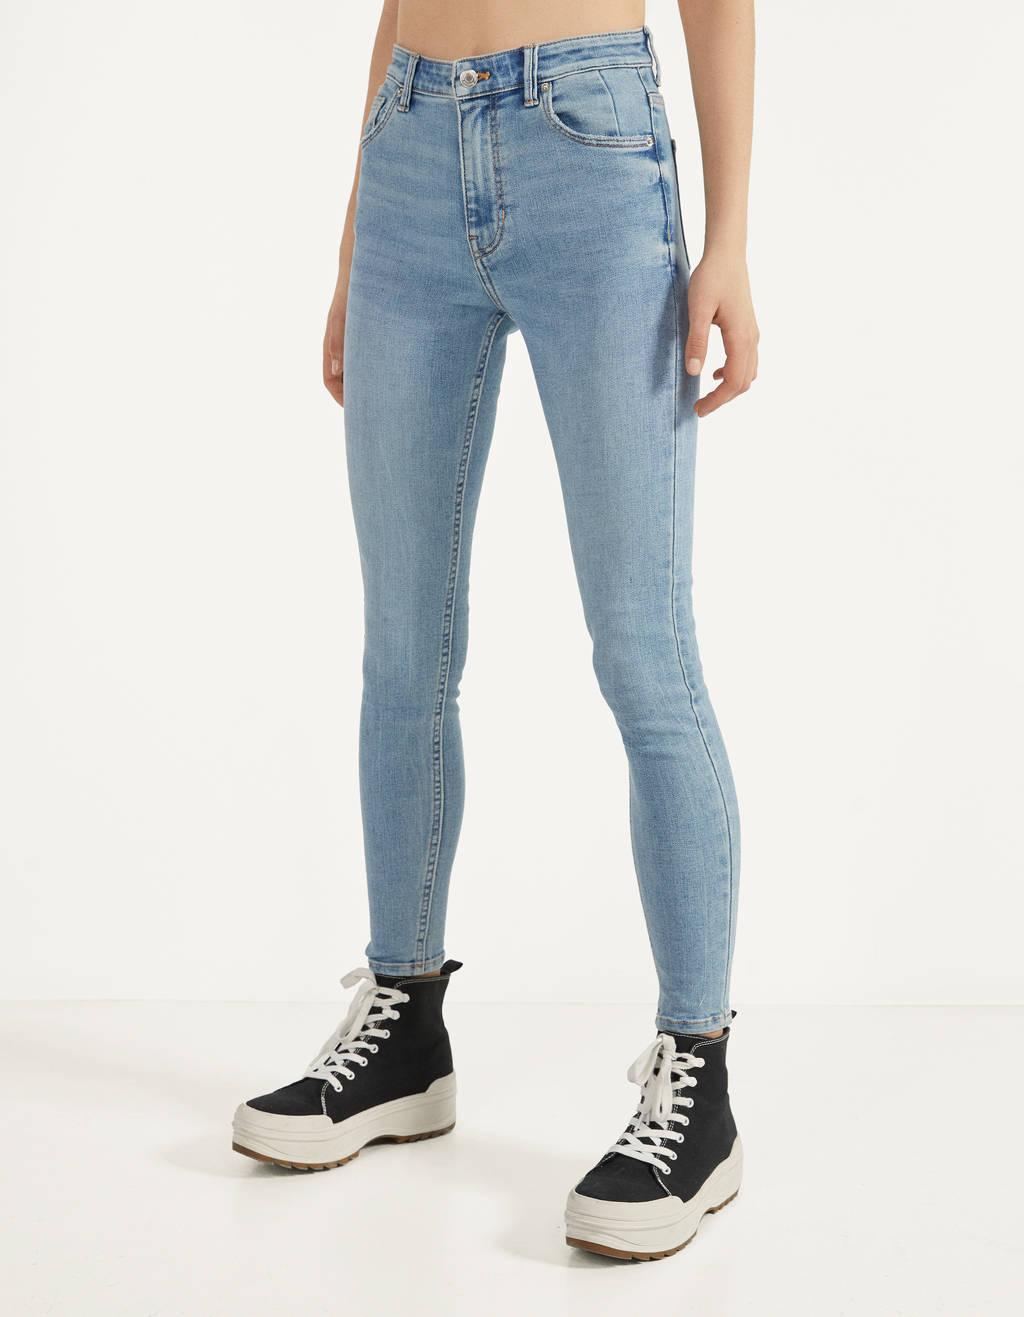 JEANS da Donna High Waist Pantaloni Con Borchie S 36 M 38 Jeans Stretch Pantaloni Alta Bund